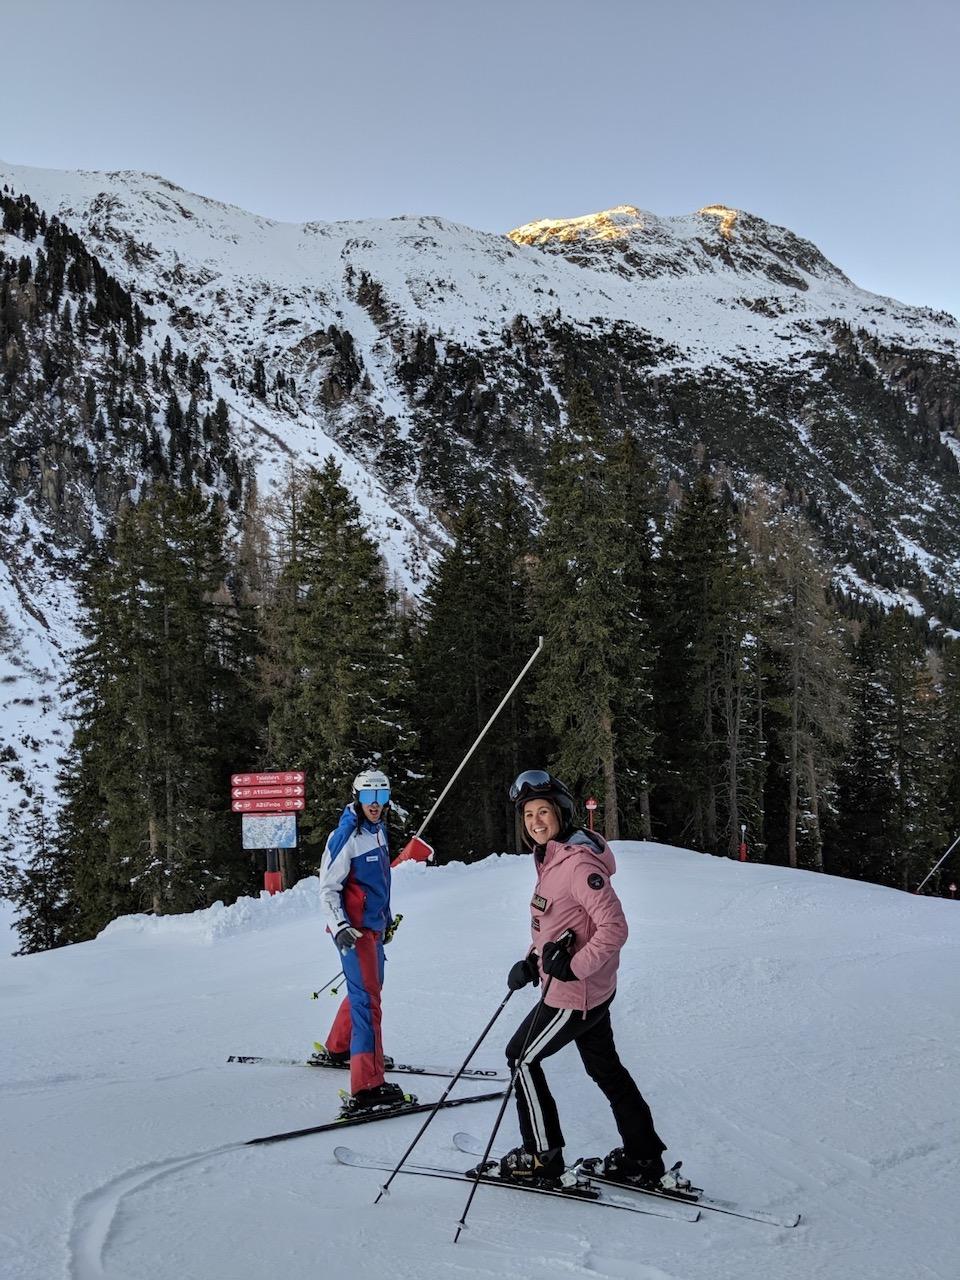 Ischgl ski - wintersport tips - Samnaun - skimap Ischgl - Schhmugglerrunden/ Smuggler's circuits - Mogasi and Choe Sterk